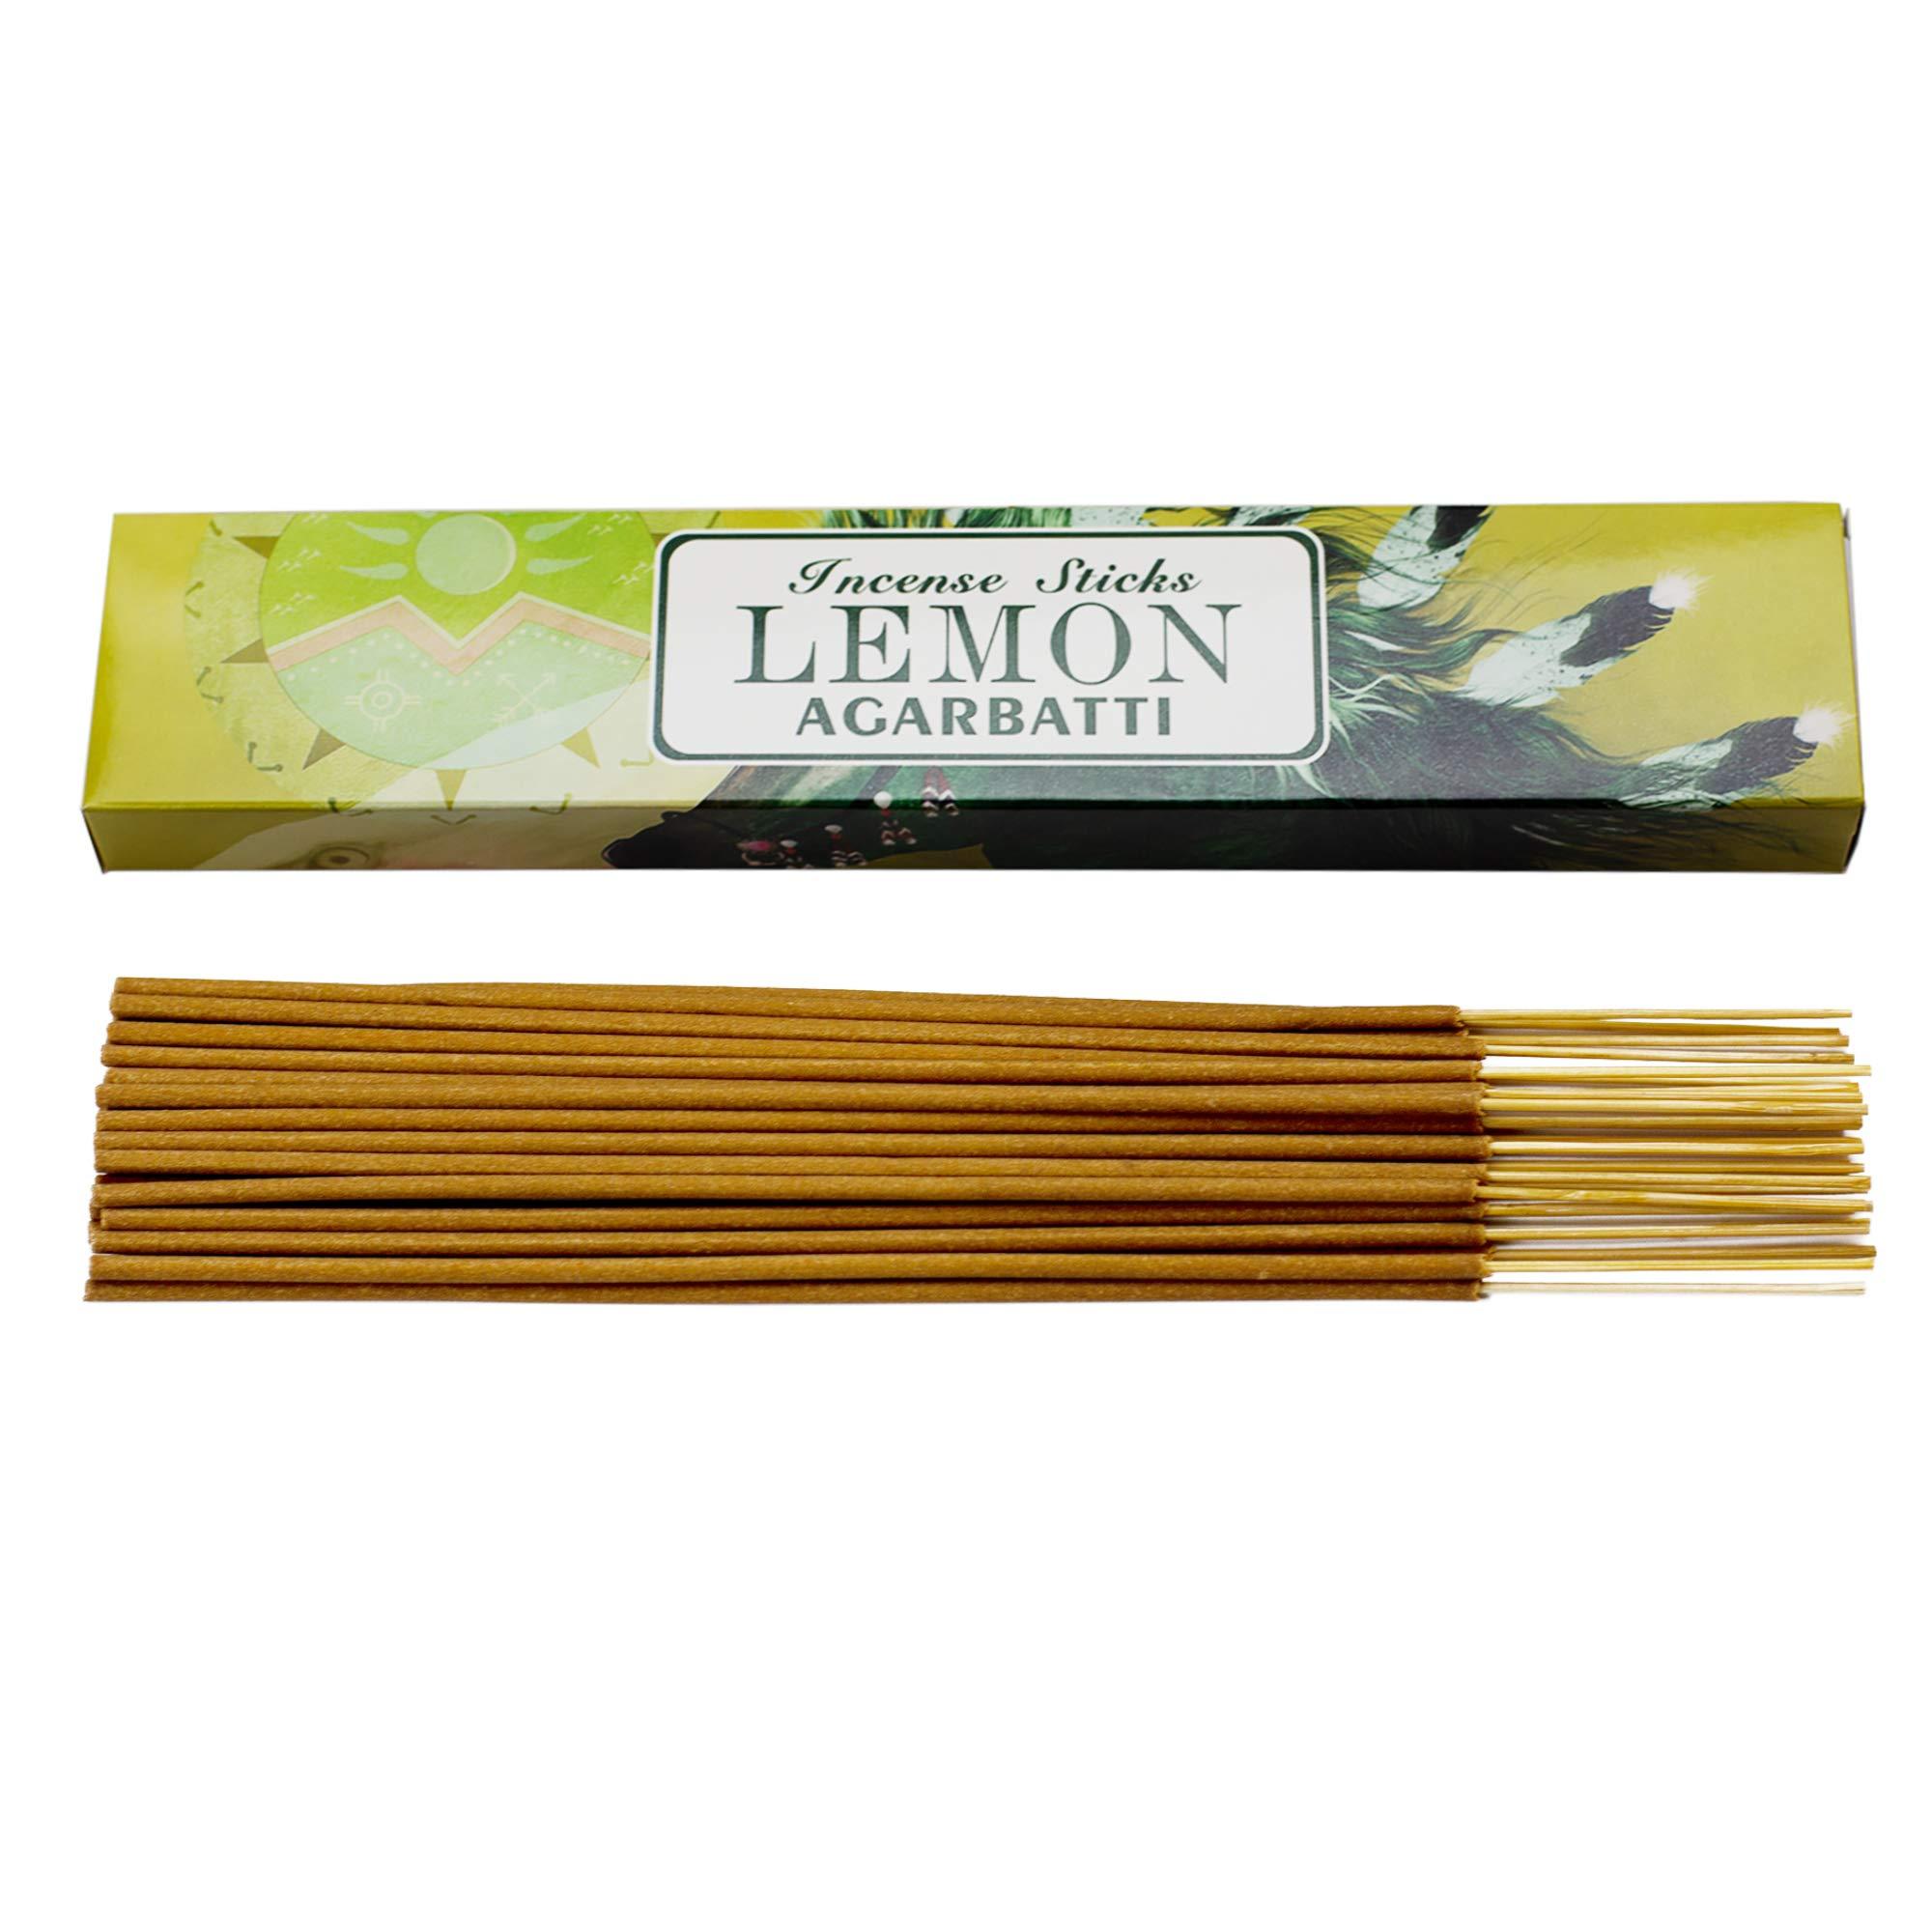 Mosfantal Premium Hand Dipped Incense Sticks - Lemon, Jasmine, Lavender, Vanilla, Apple, Variety Gift Pack (240Gram) by Mosfantal (Image #4)